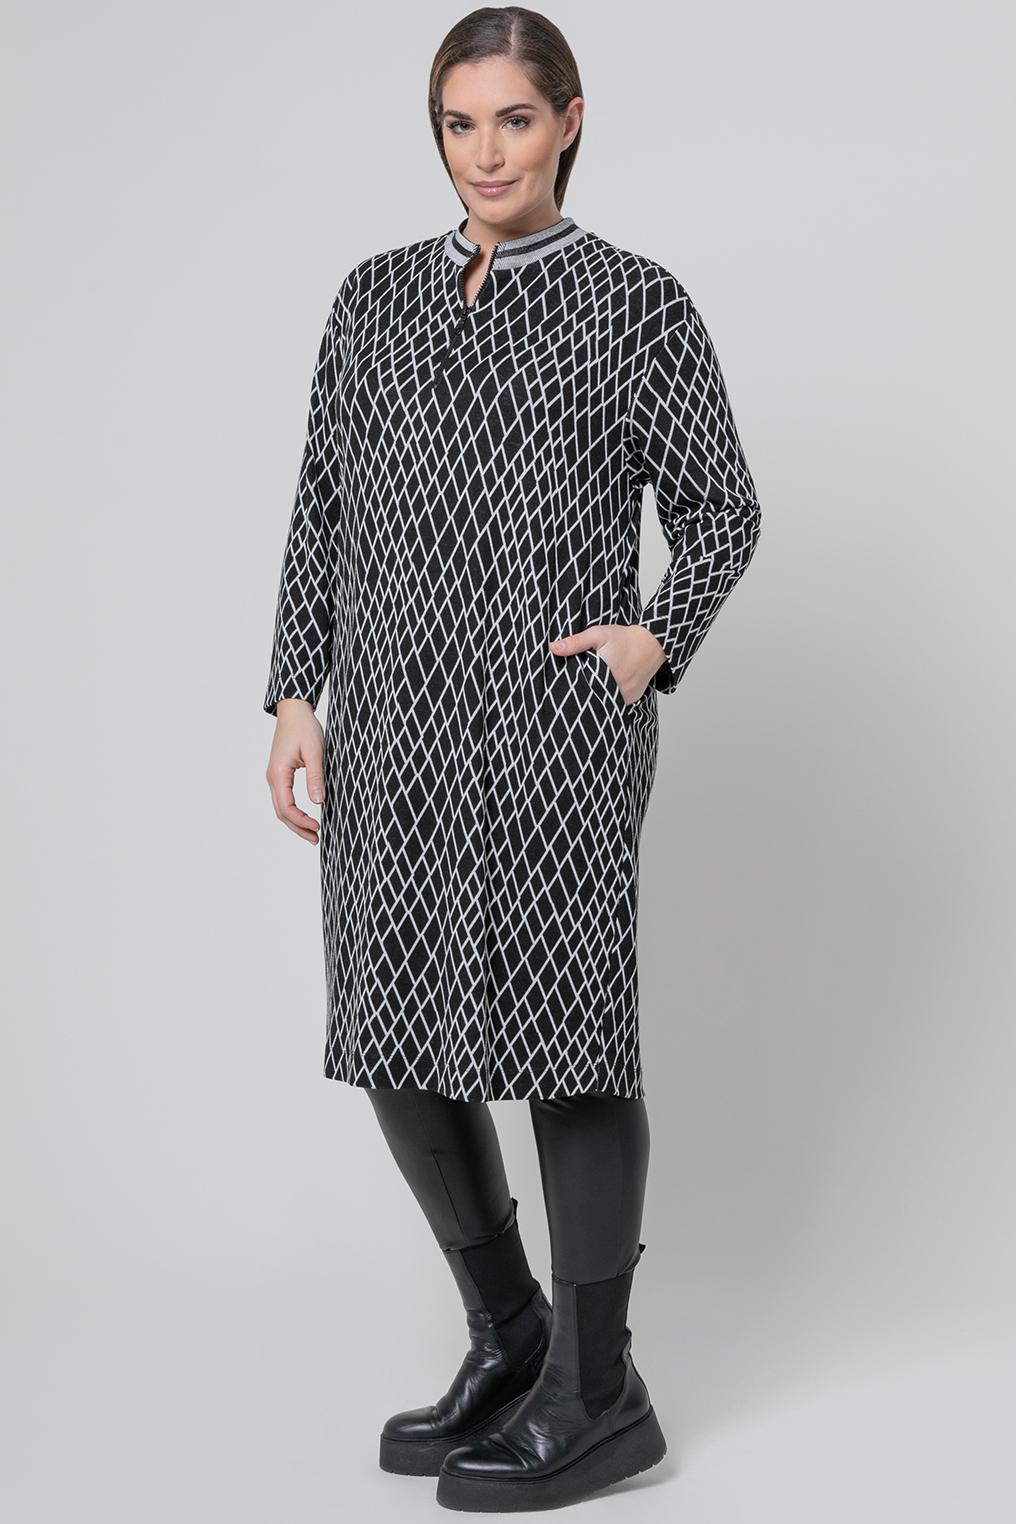 Mat fashion tuniek print